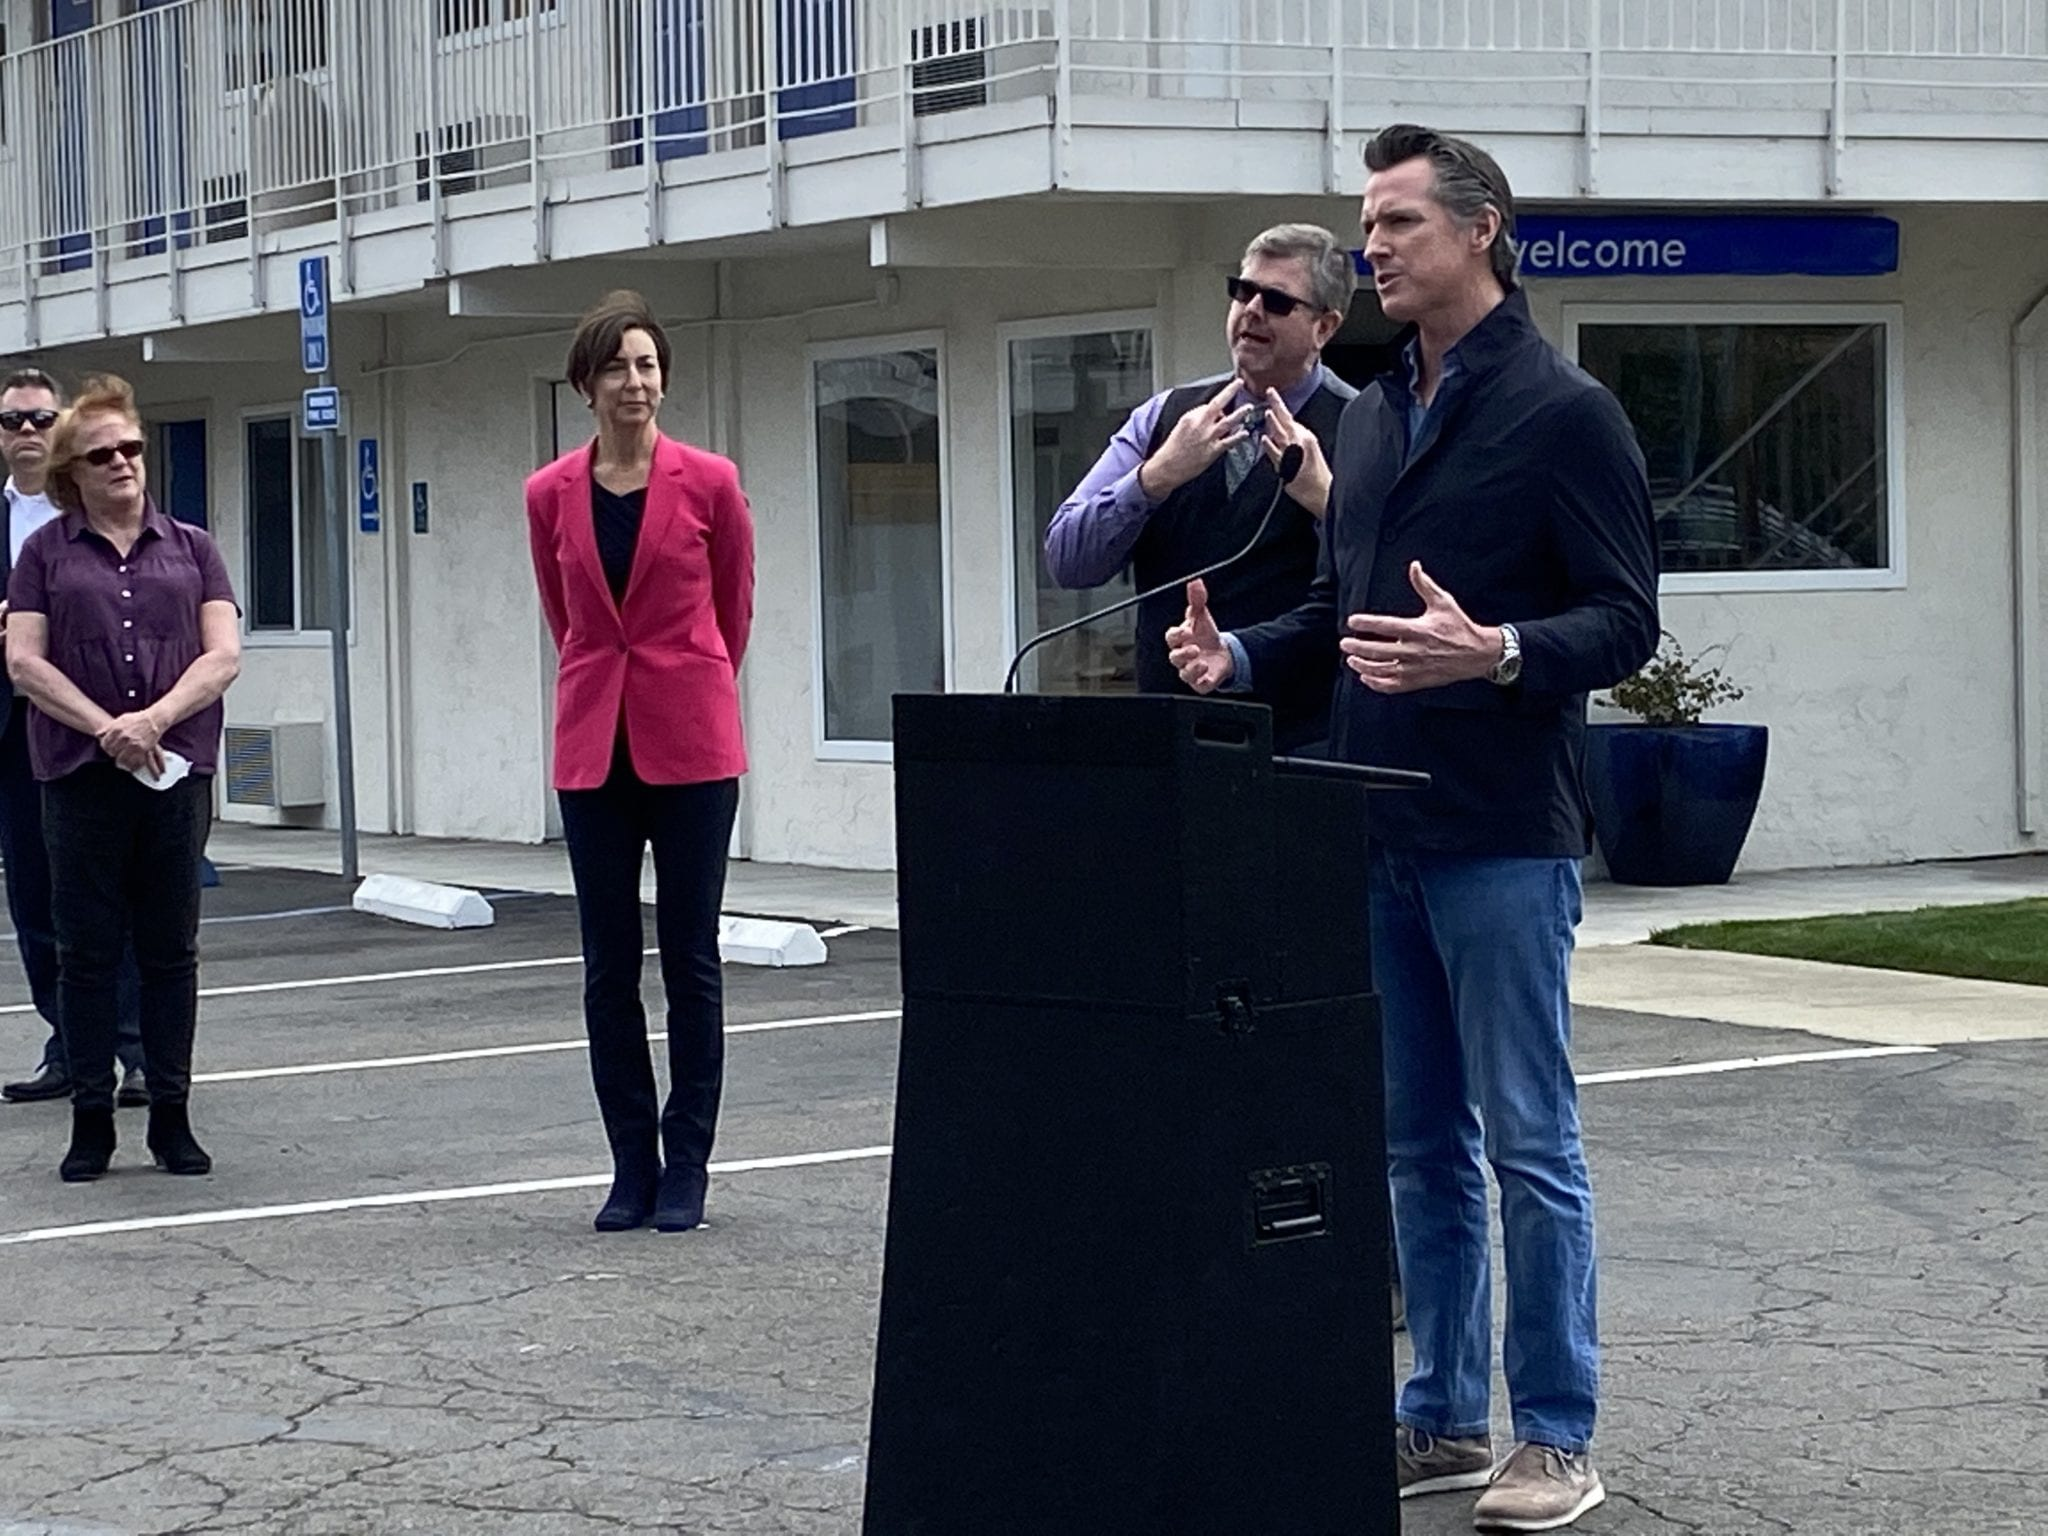 Roberts: Addressing homelessness is not a political winner